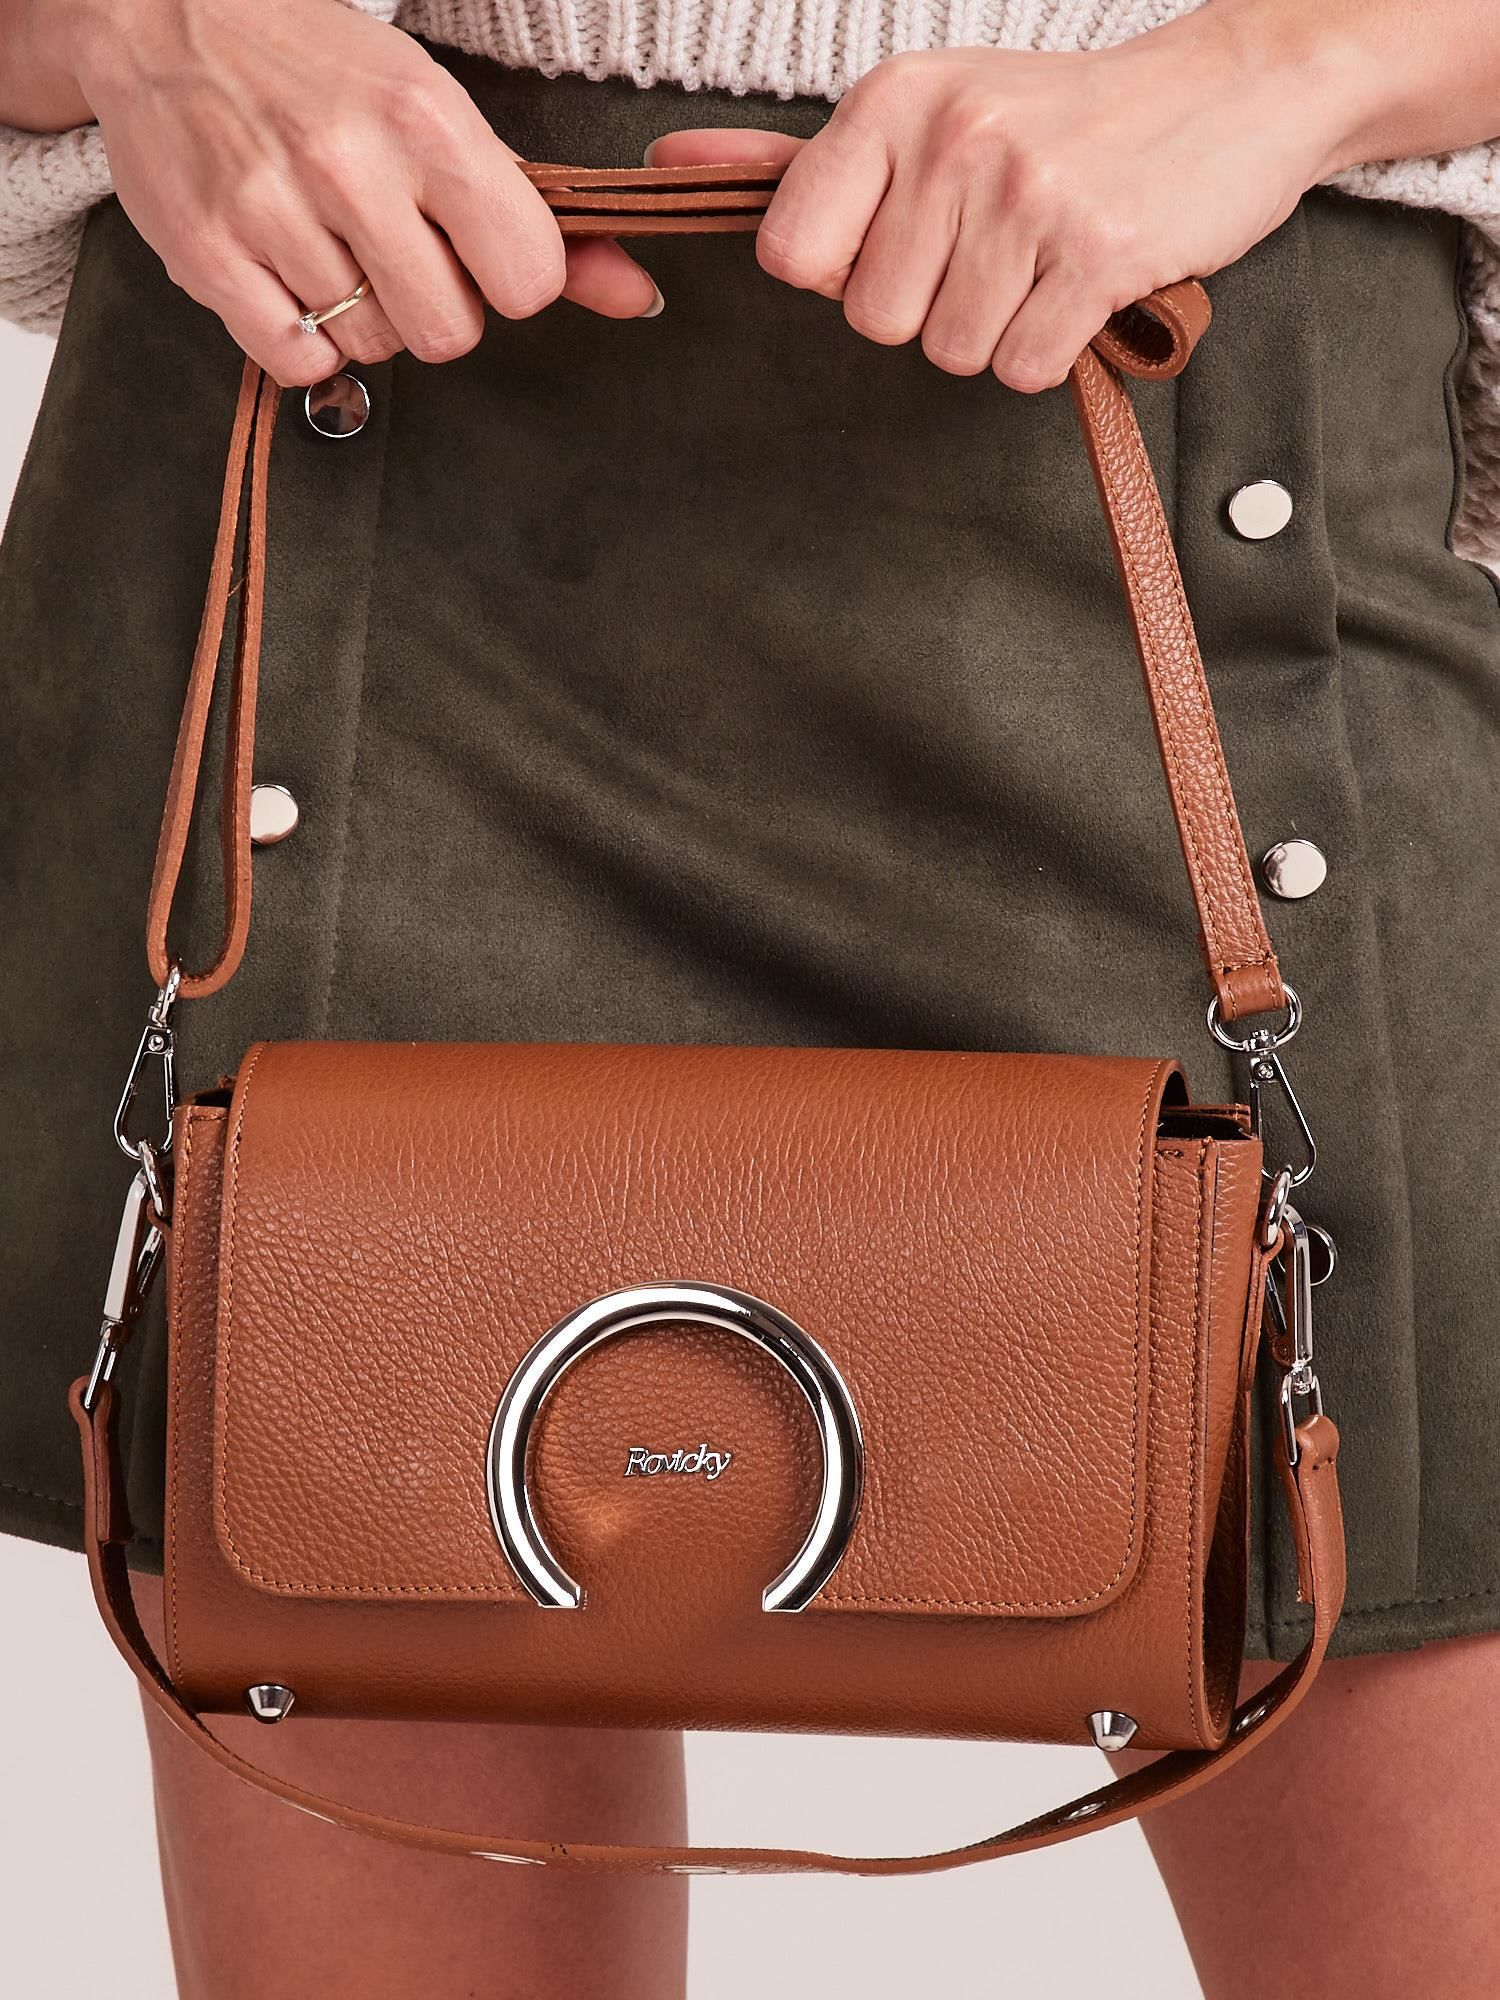 60e22769bf7e1 Brązowa elegancka listonoszka ze skóry - Akcesoria torba - sklep ...